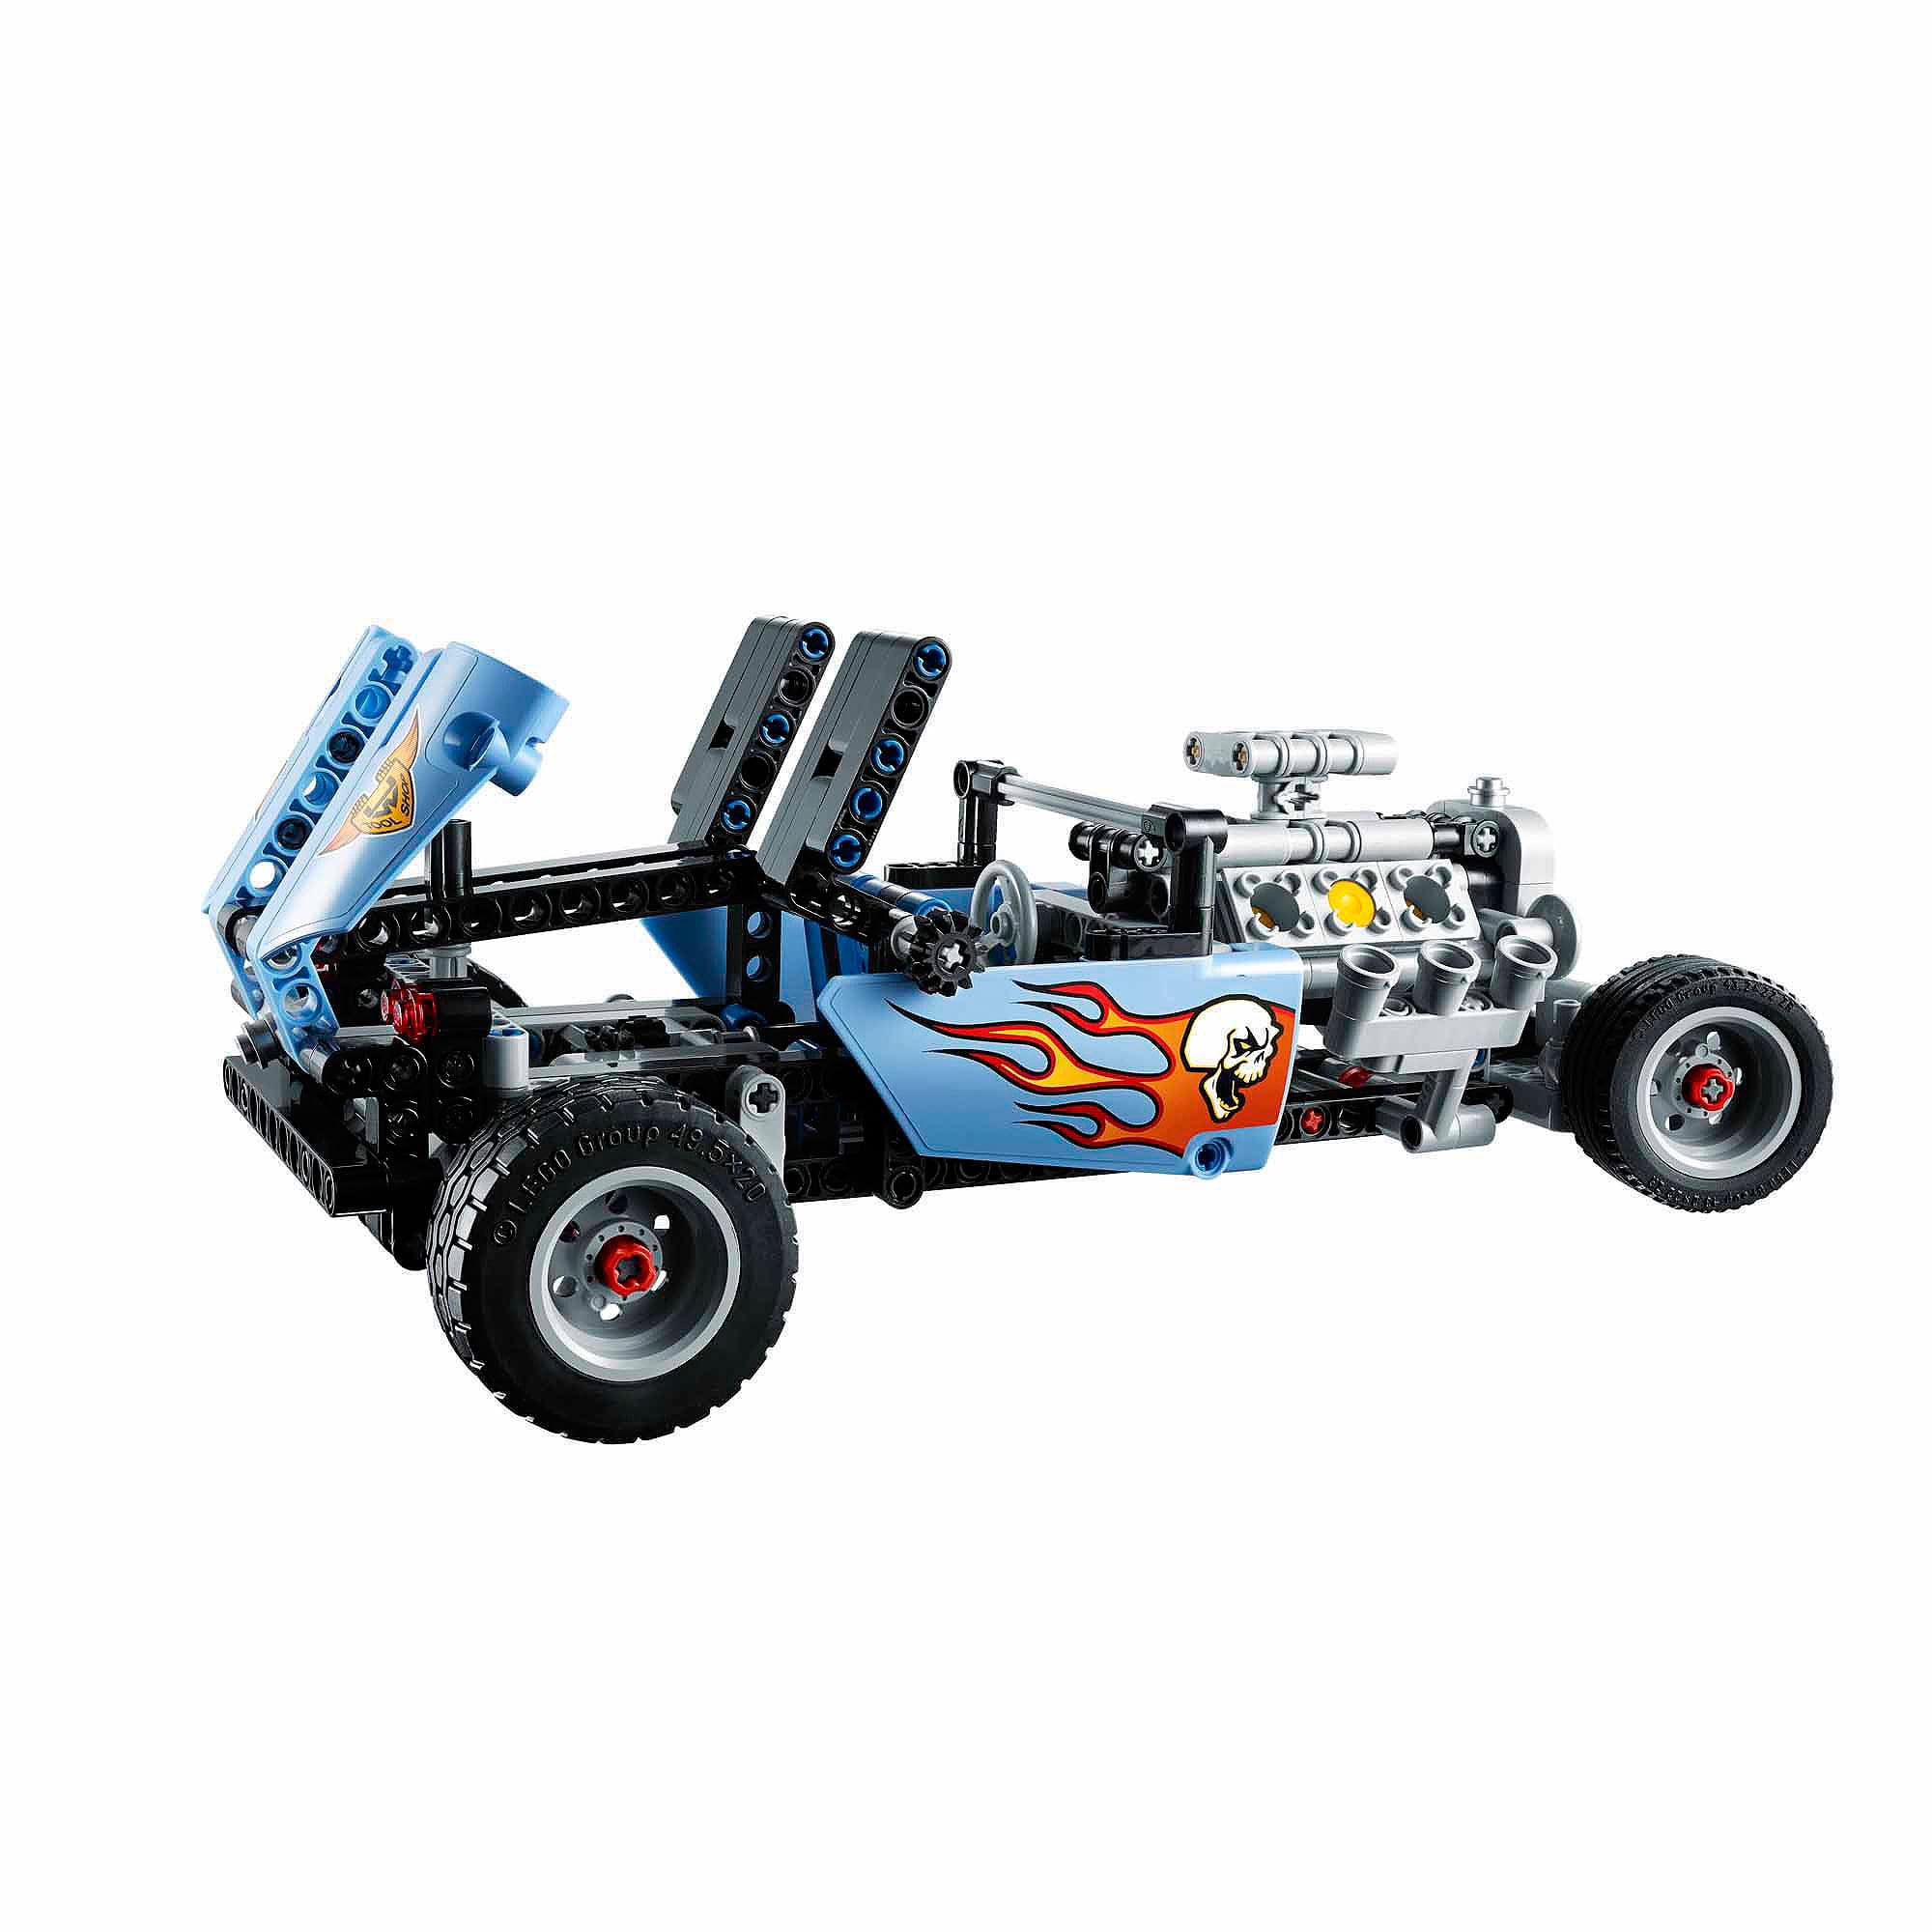 Lego Technic Hot Rod Walmartcom